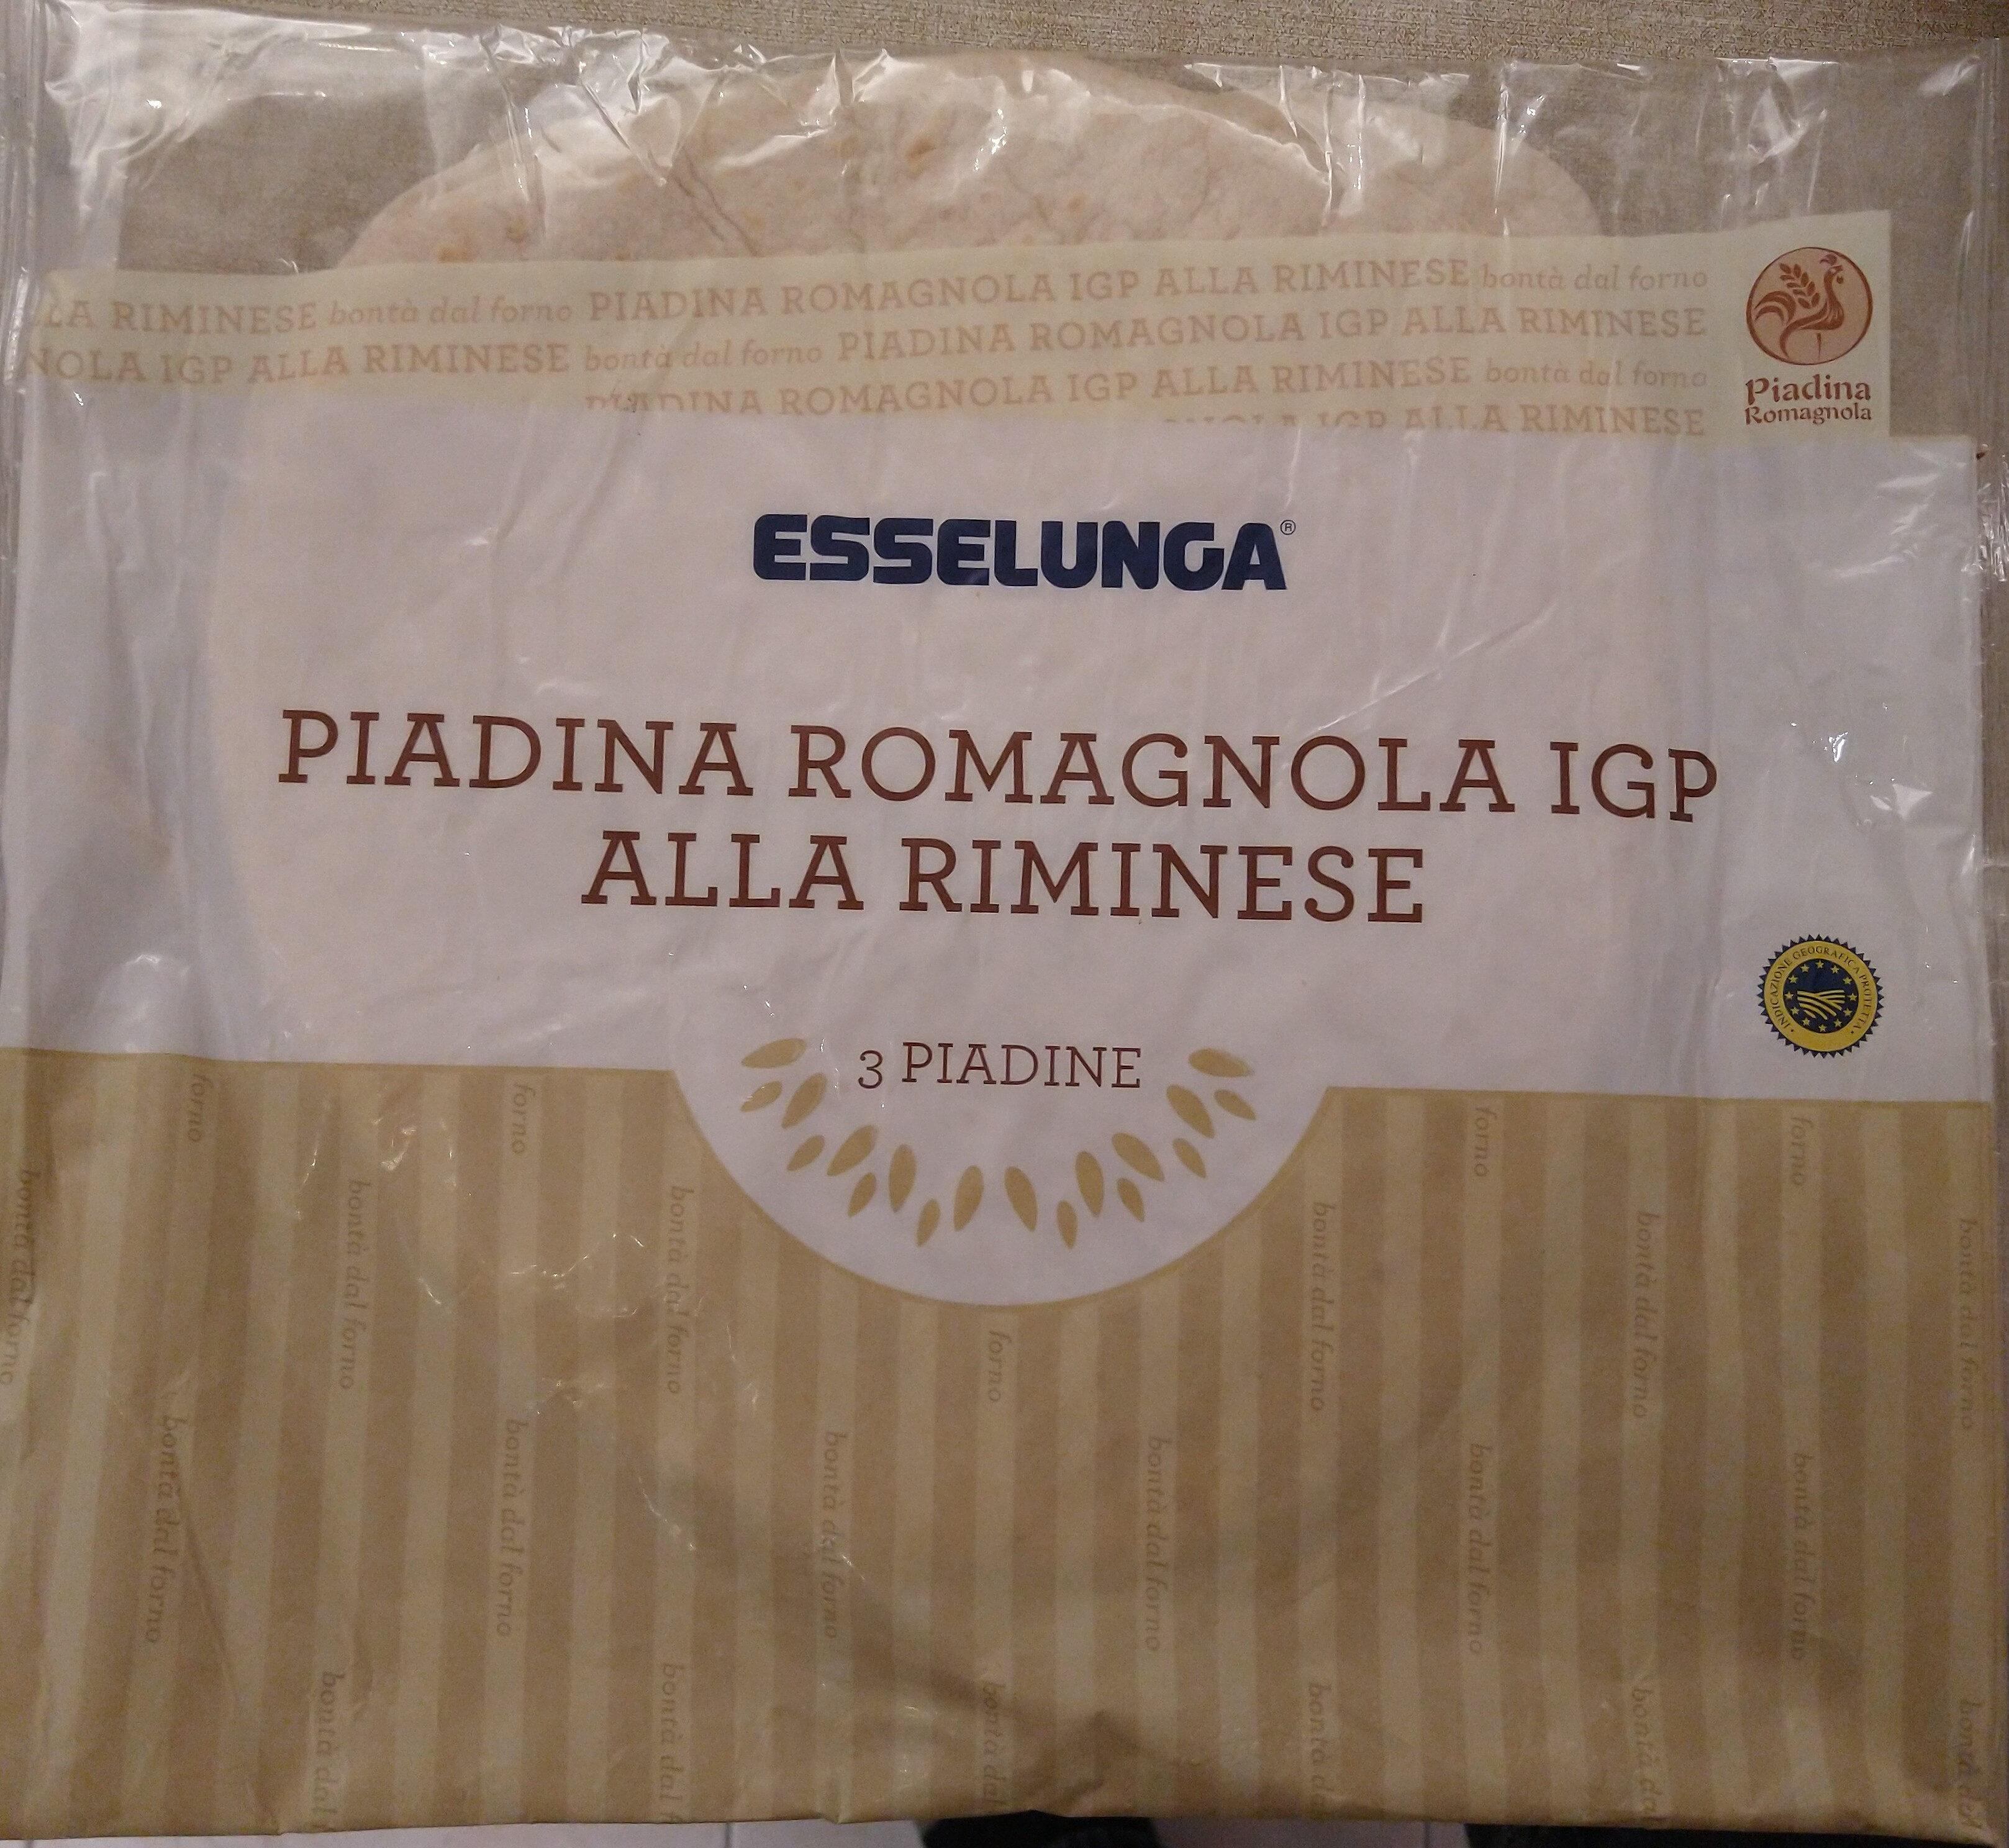 Piadina romagnola IGP alla riminese Esselunga - Product